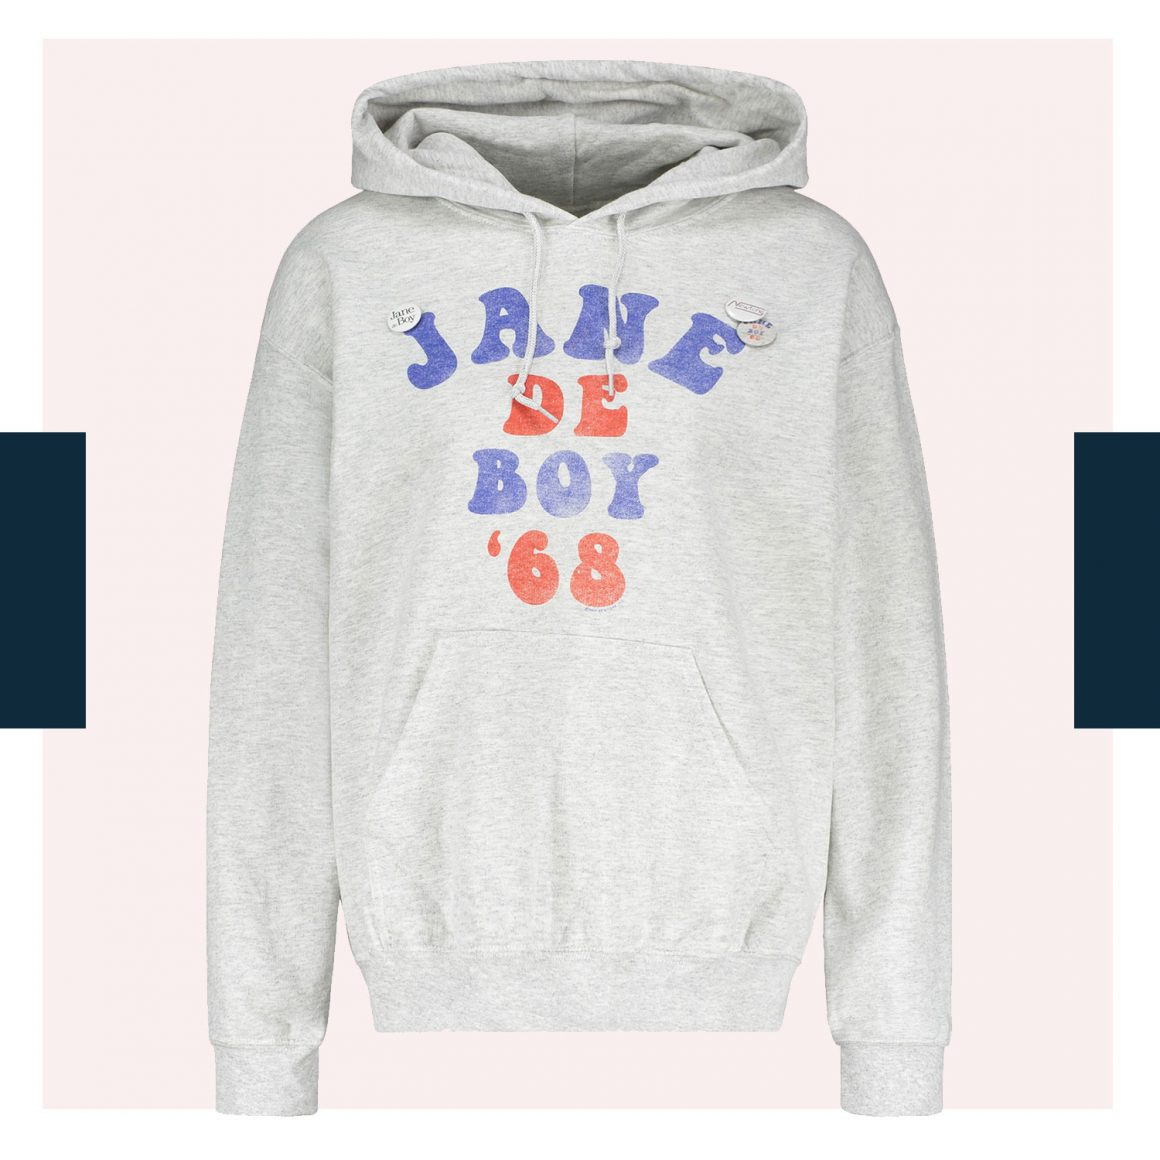 Le hoodie « Jane de Boy '68 » de Newtone